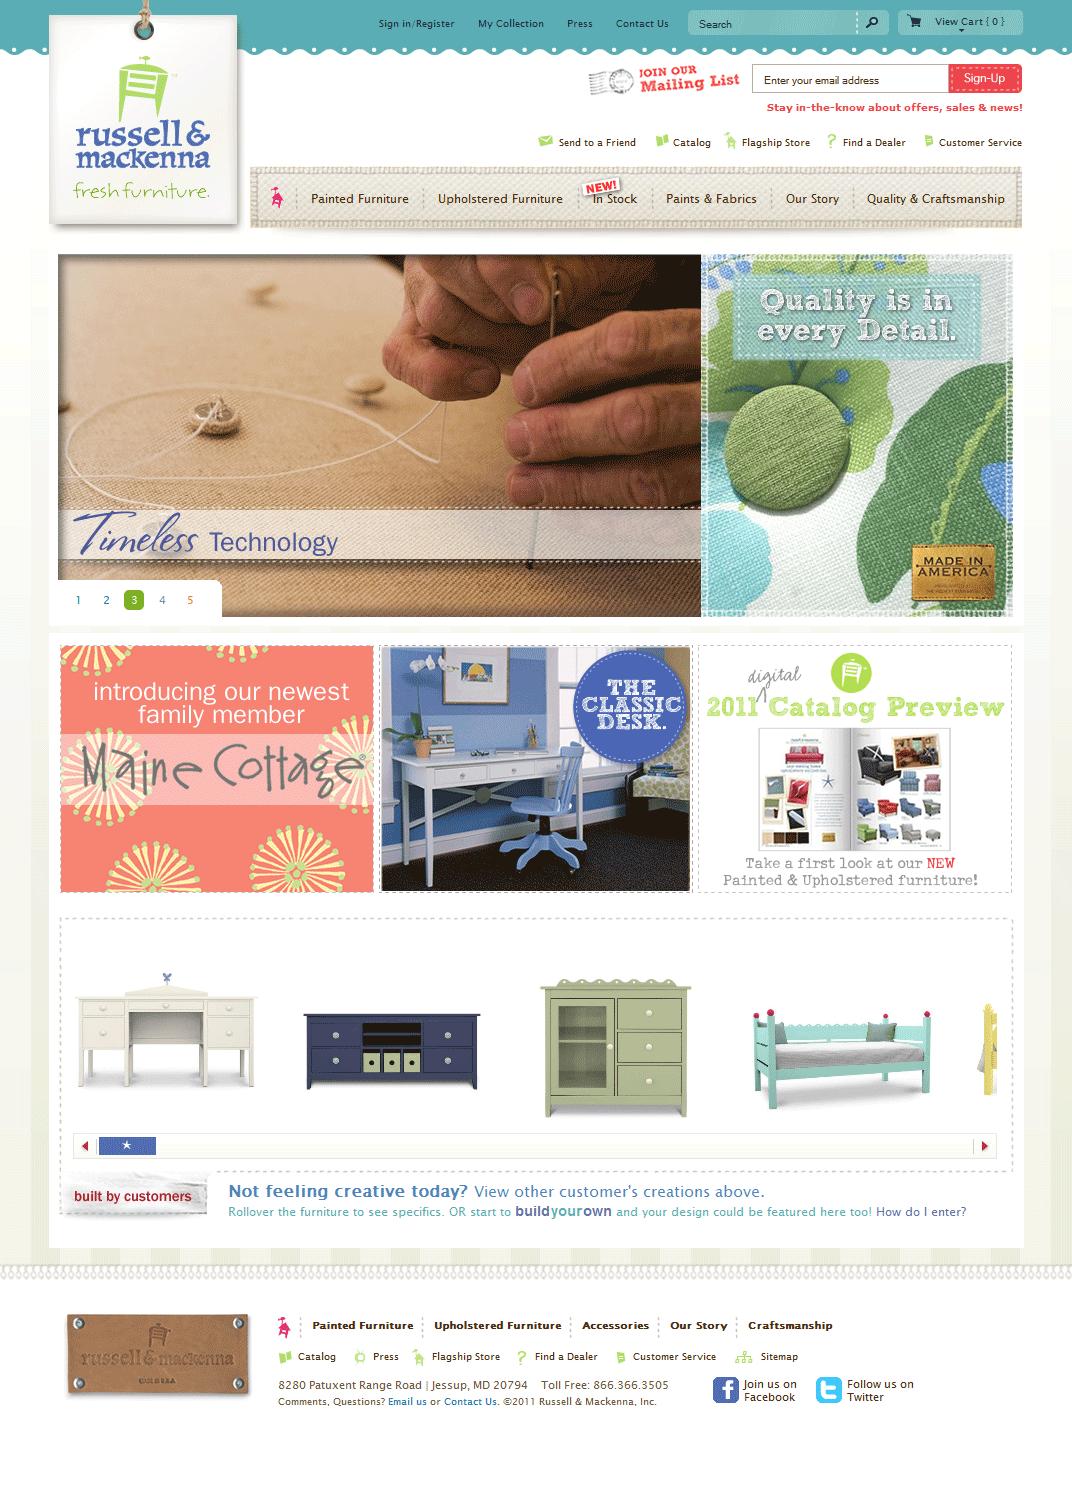 Ecommerce Website Design Web Designers Logopeople India Websites Designingwebsites Designwebsite Ecommerce Website Design Web Design Website Design